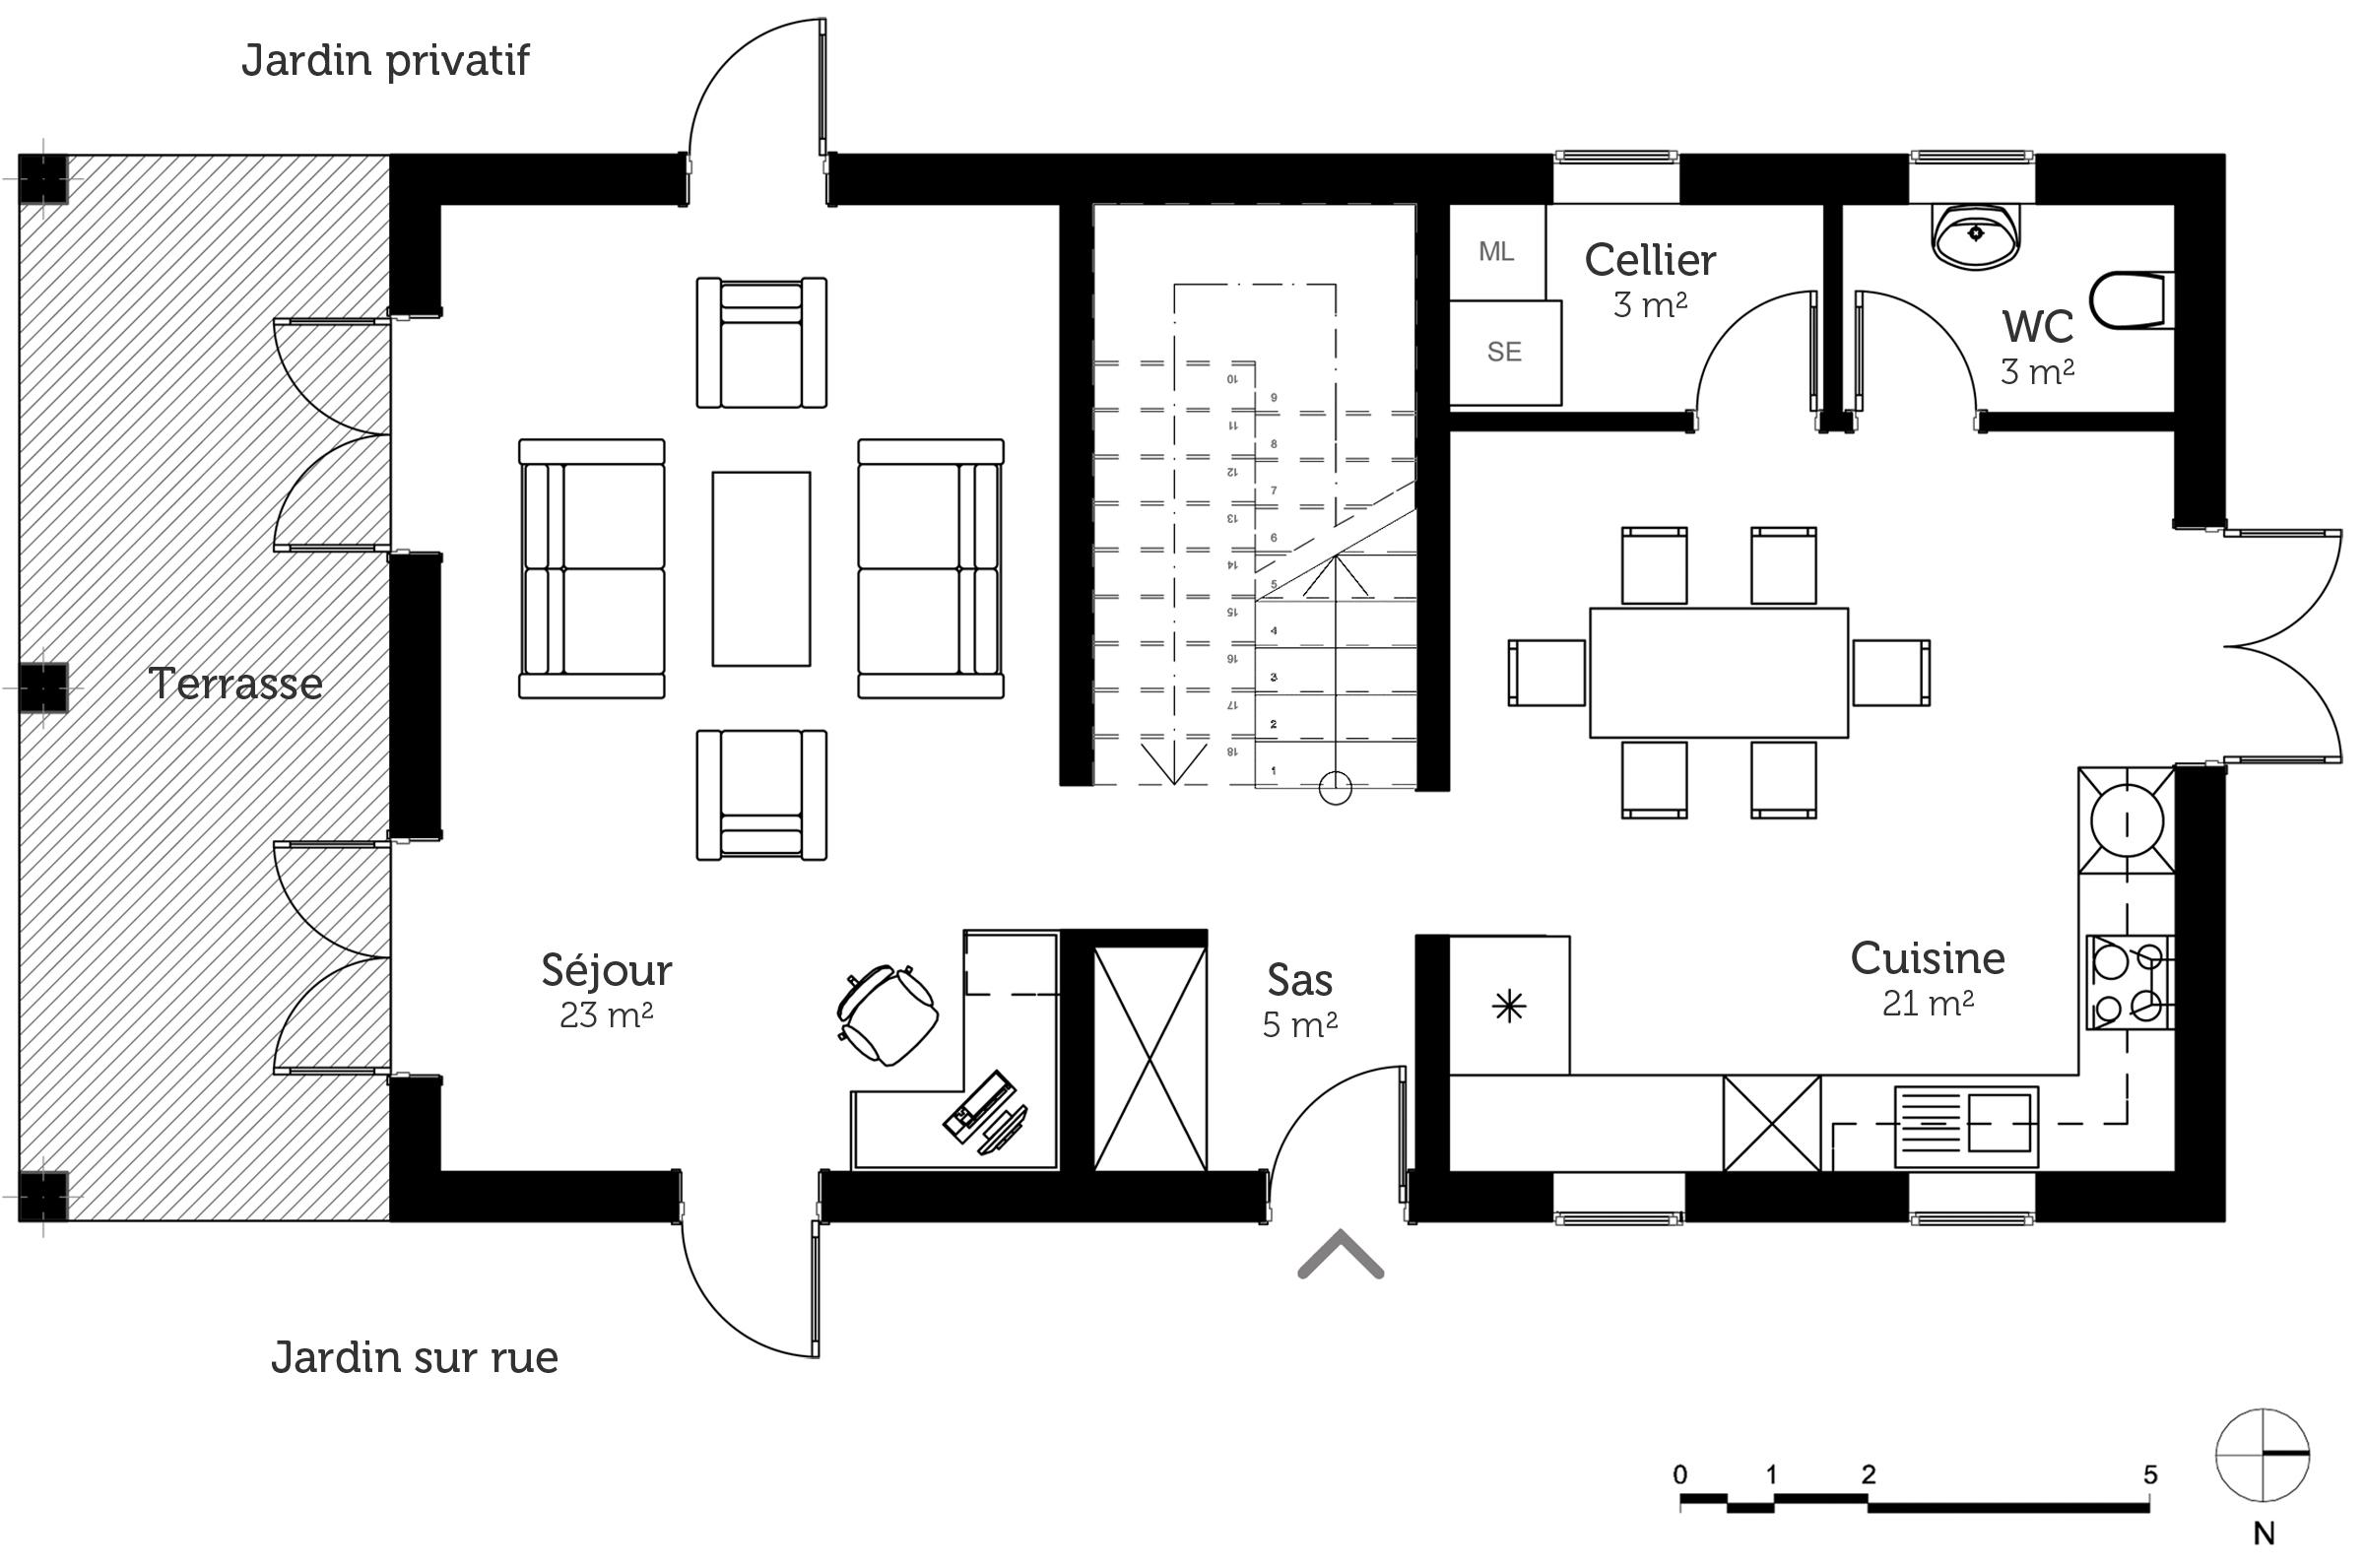 maison etage avec plan. Black Bedroom Furniture Sets. Home Design Ideas